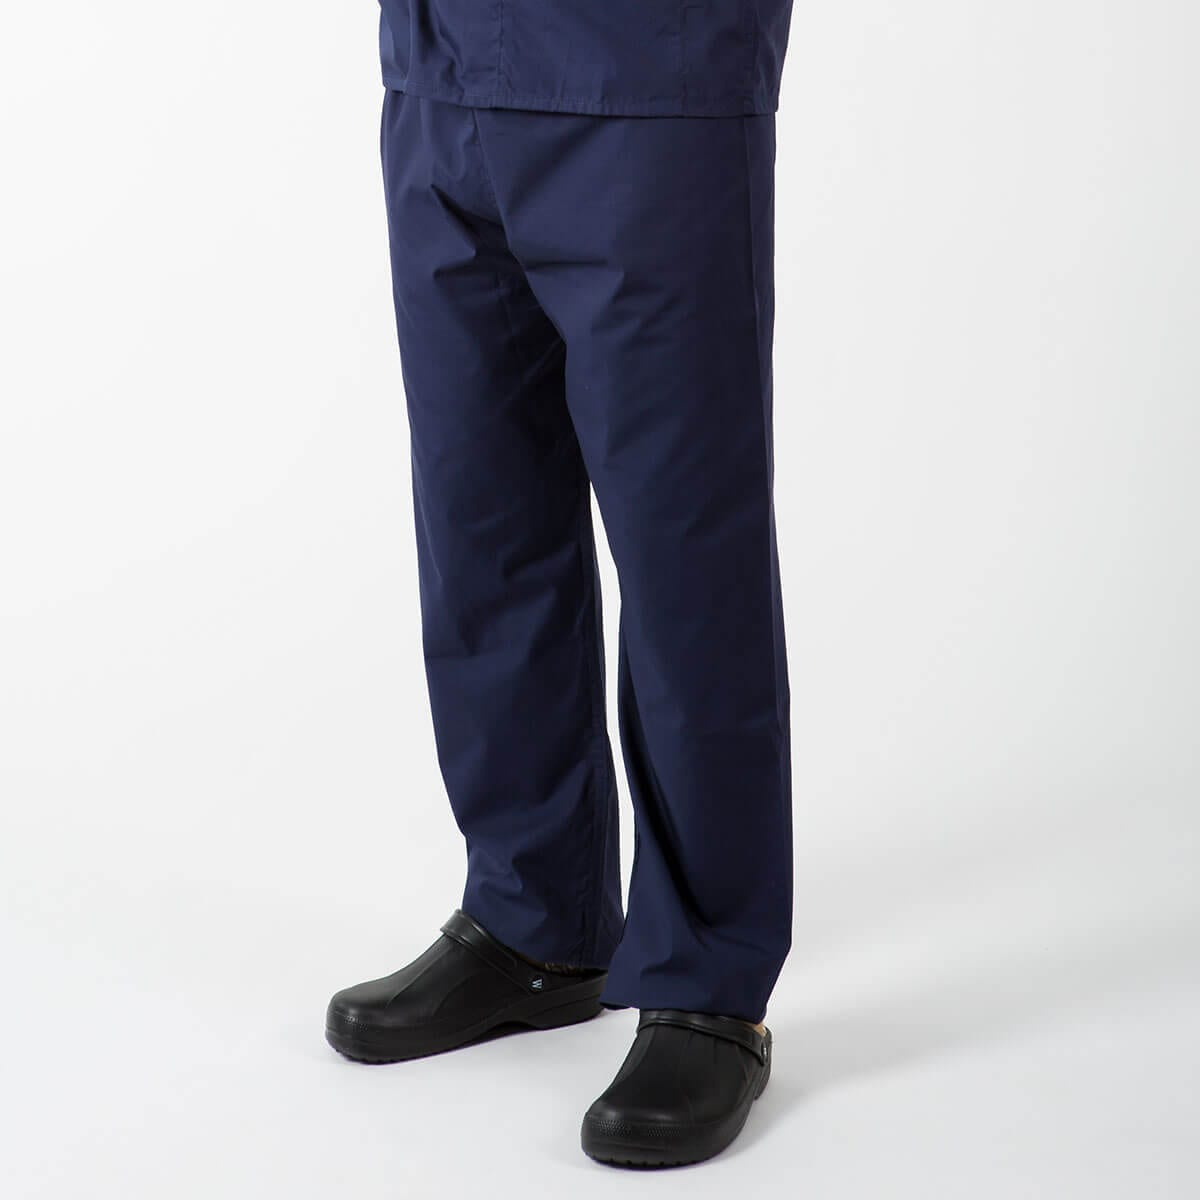 Scrub Trousers Navy | Scrub Pants Navy | Interweave Healthcare